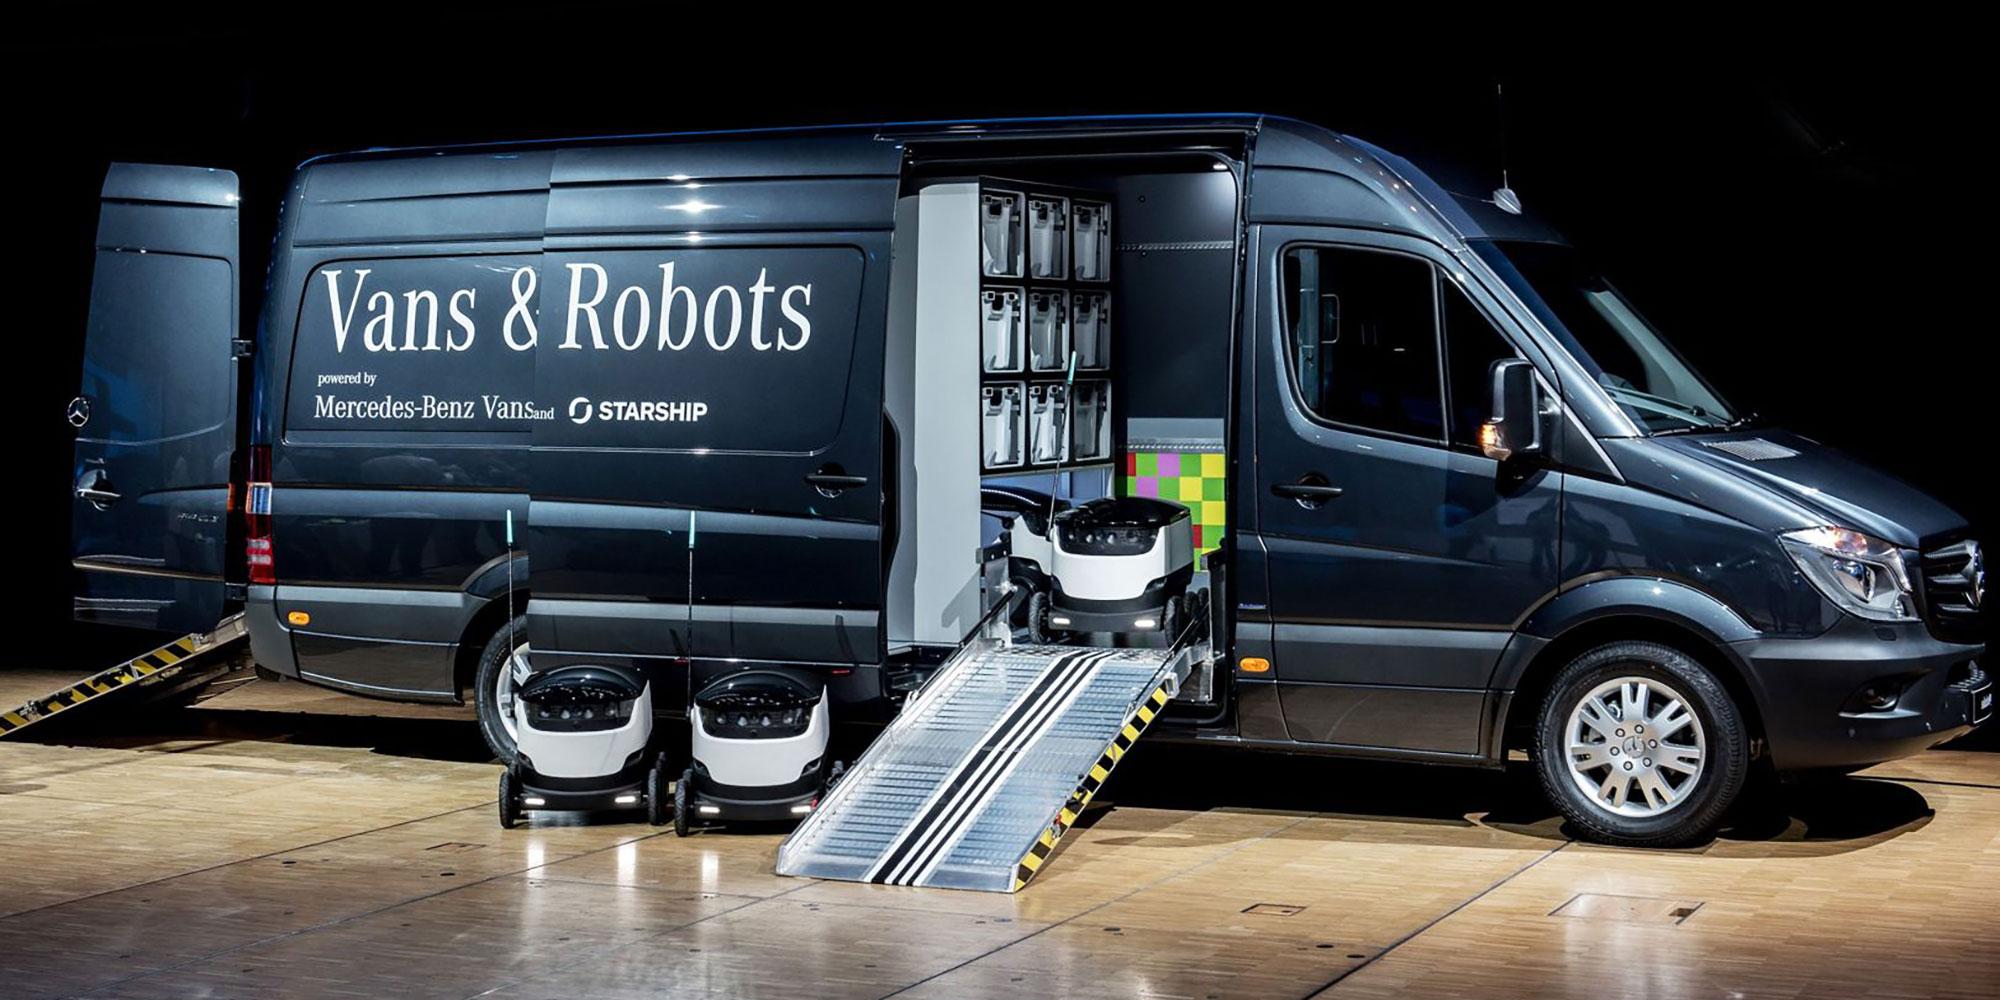 Fahrzeugbeklebung Vans & Robots